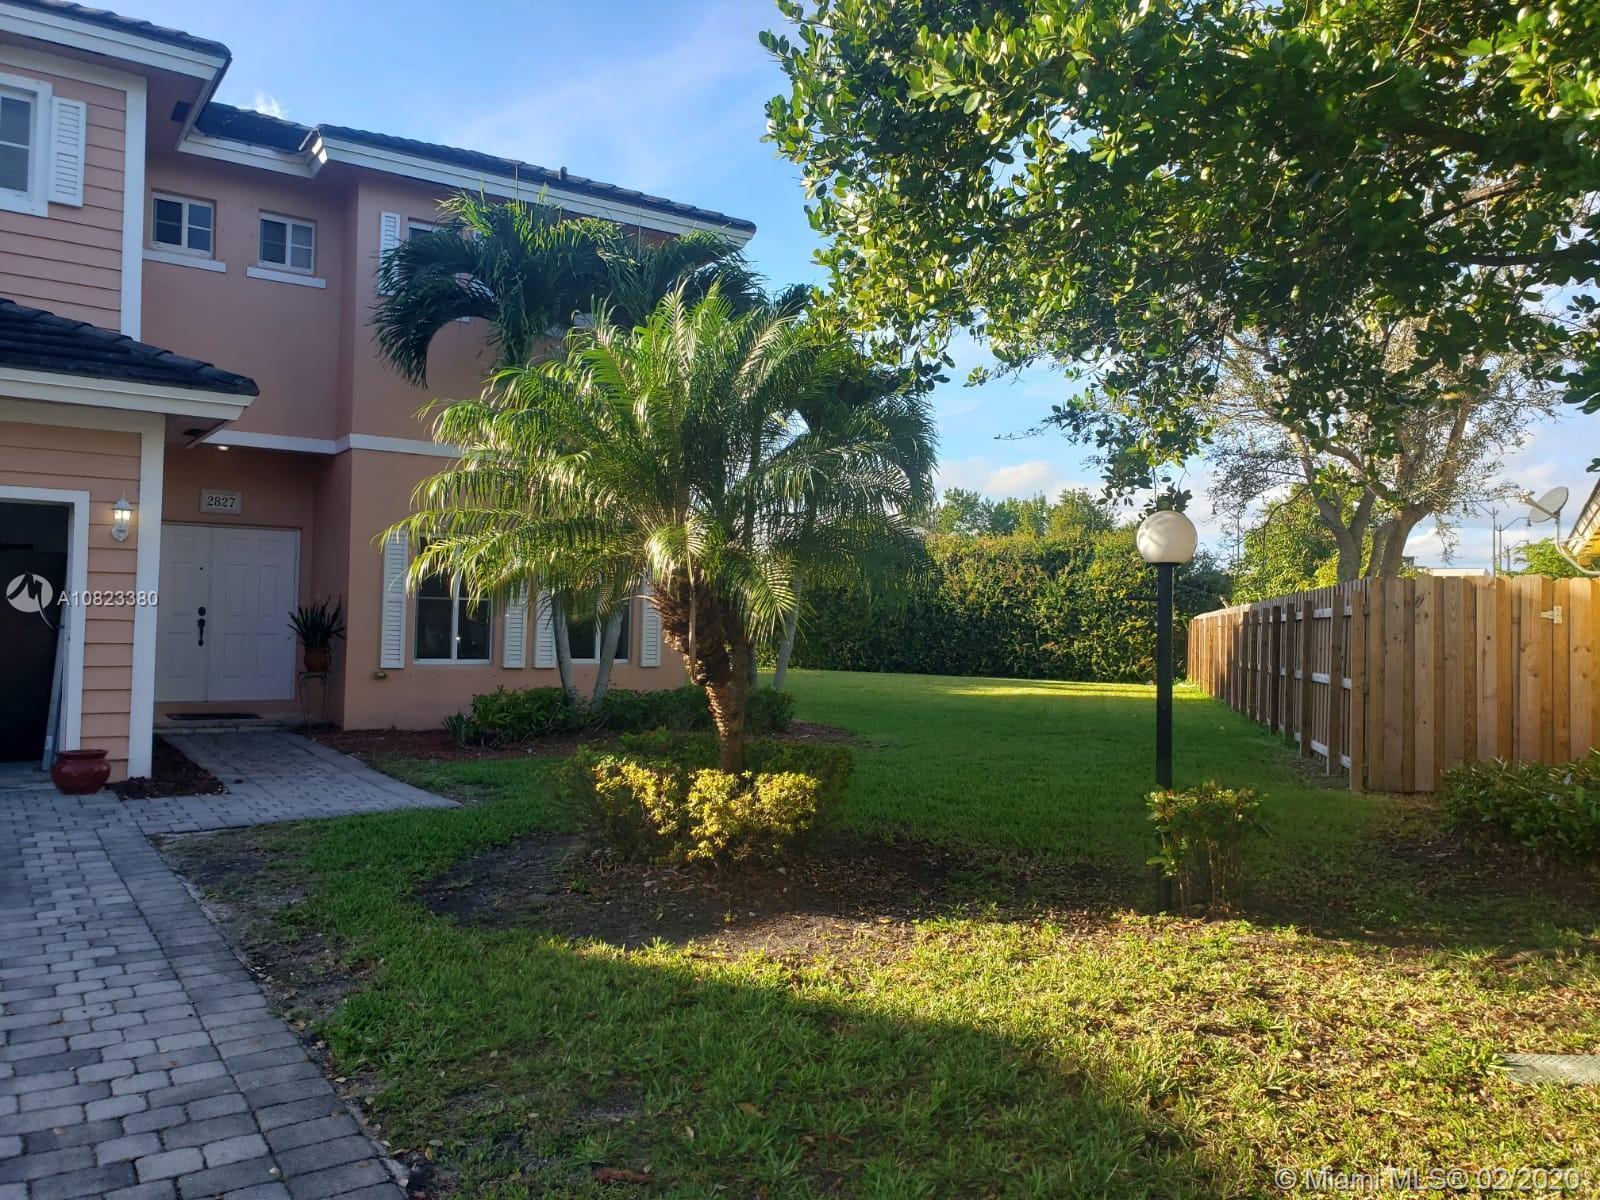 2827 NE 4th St, Homestead, FL 33033 - Homestead, FL real estate listing